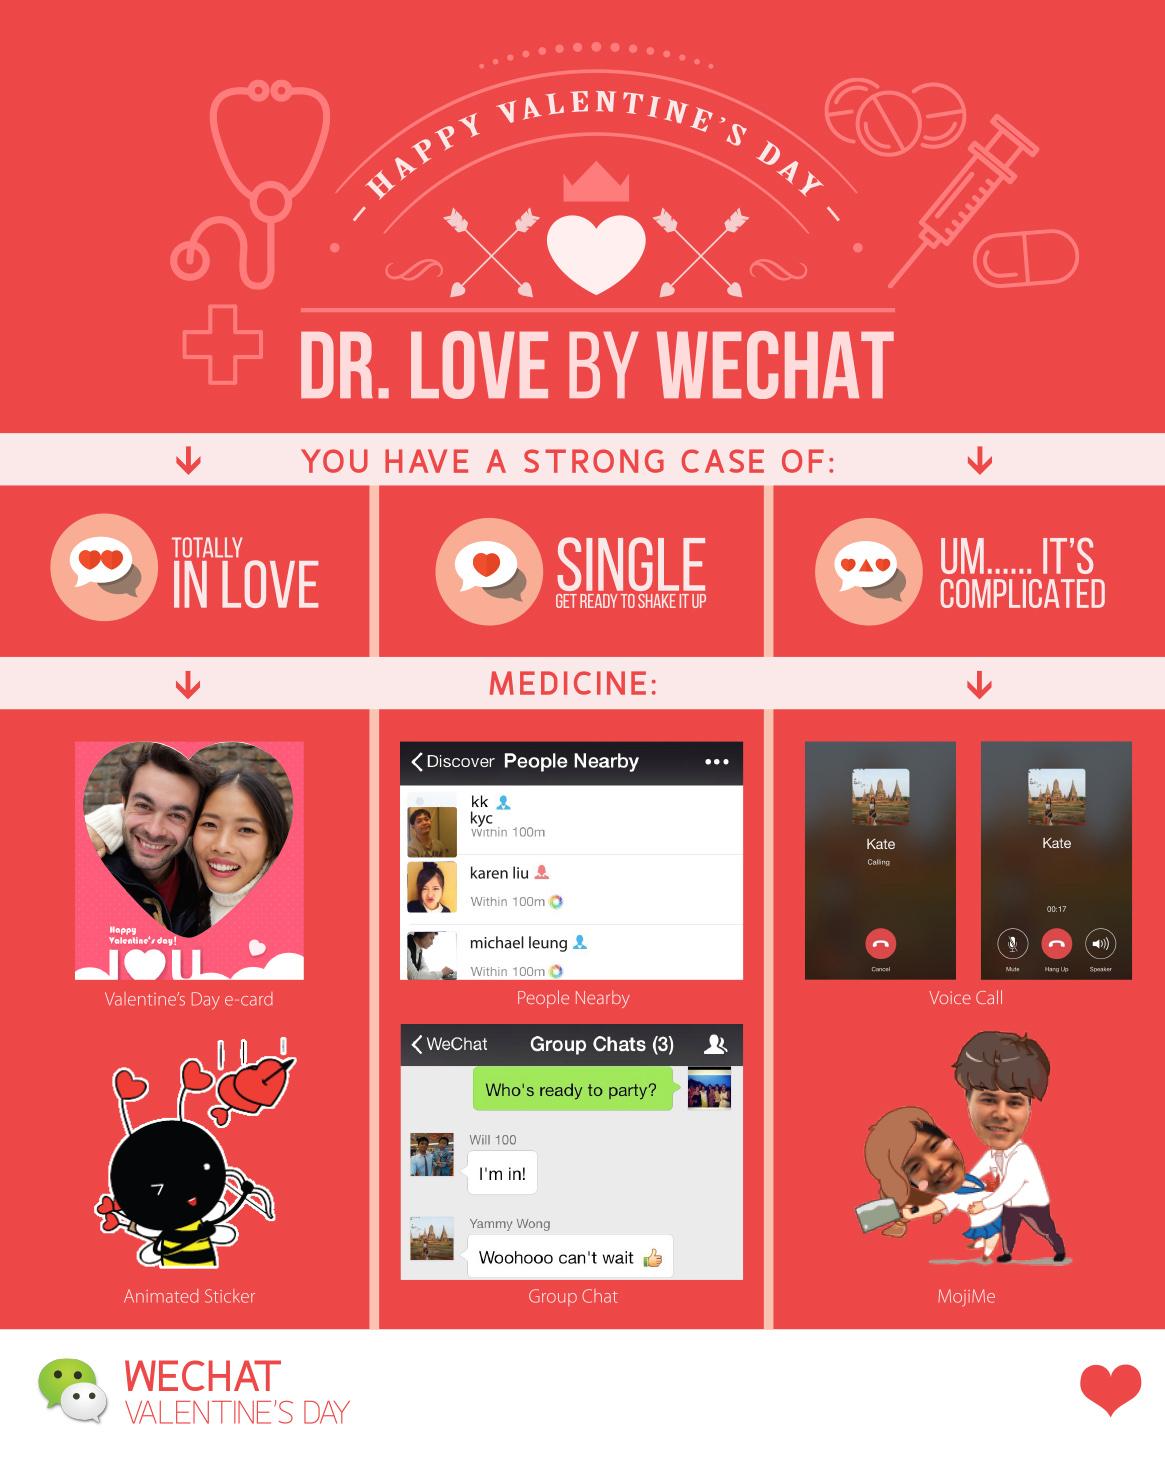 wechat_infographic_valentinesday_11